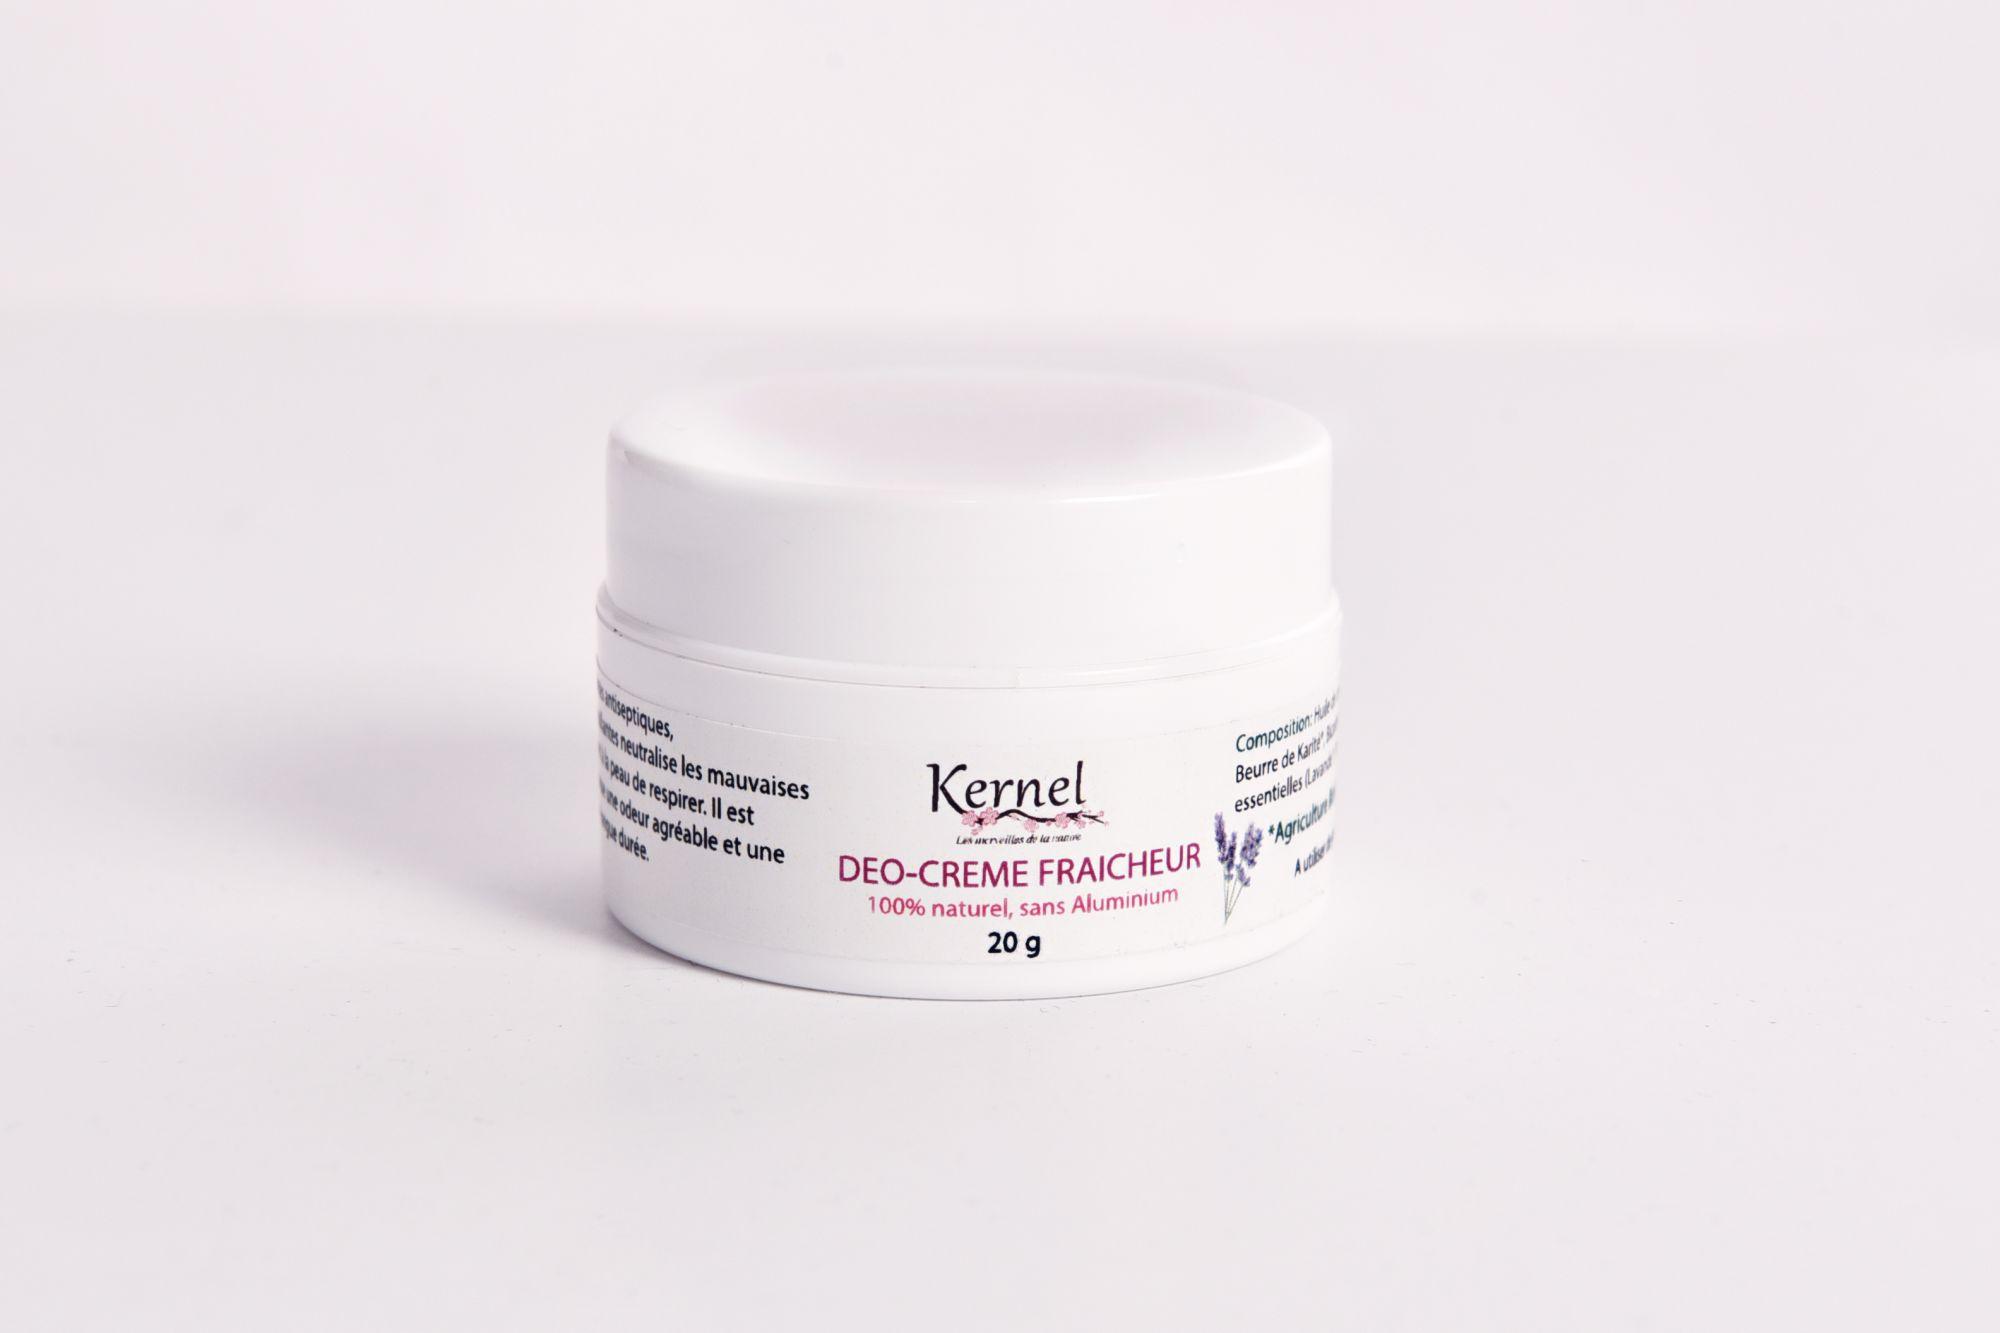 Kernel Organic Déodorant Crème fraîcheur (Cream deodorant)